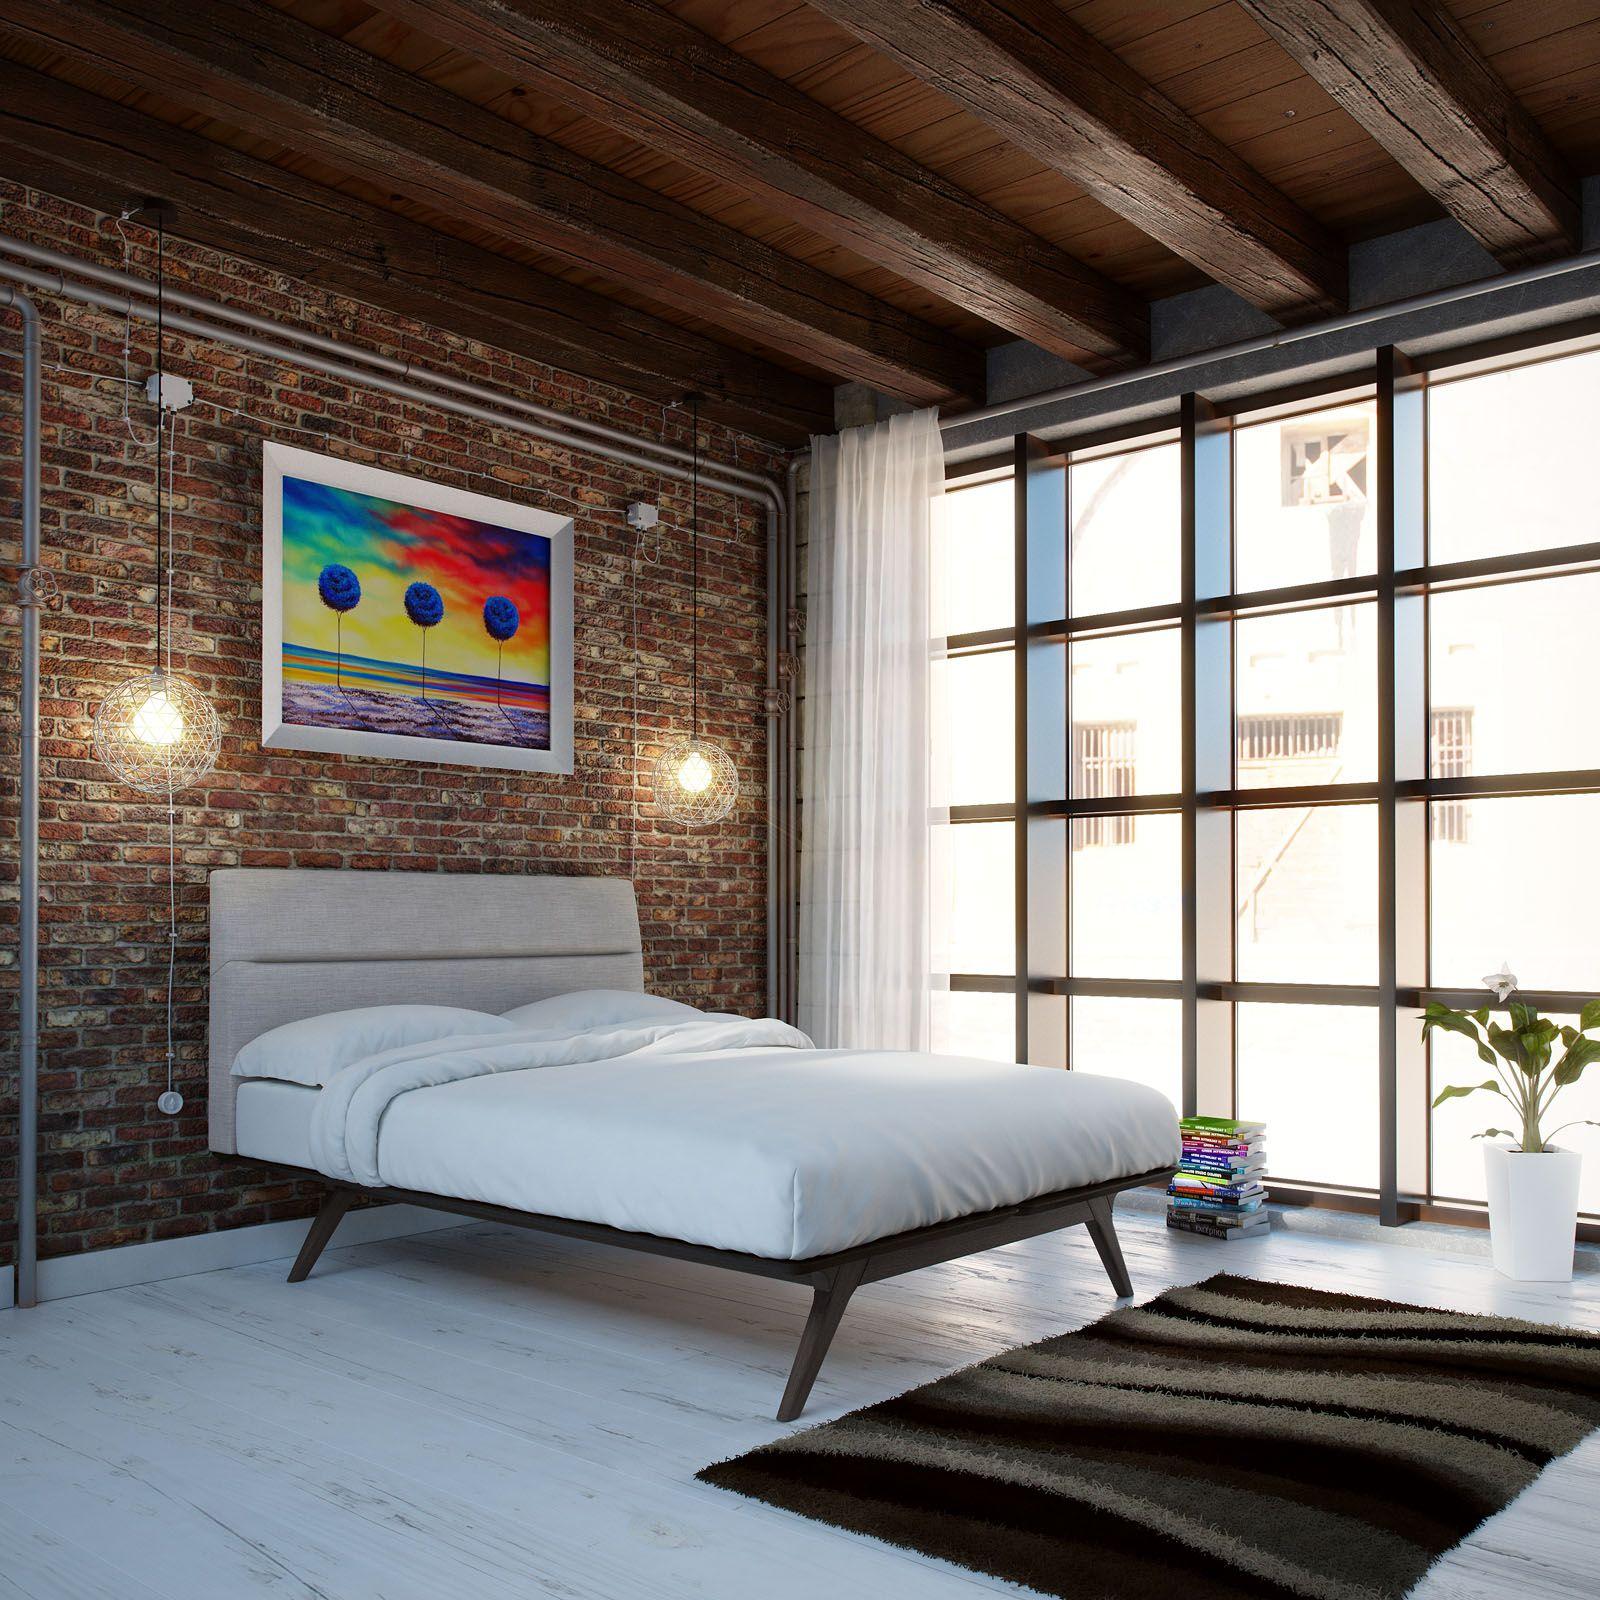 modway addison queen bed frame in black gray bedroom arrangement